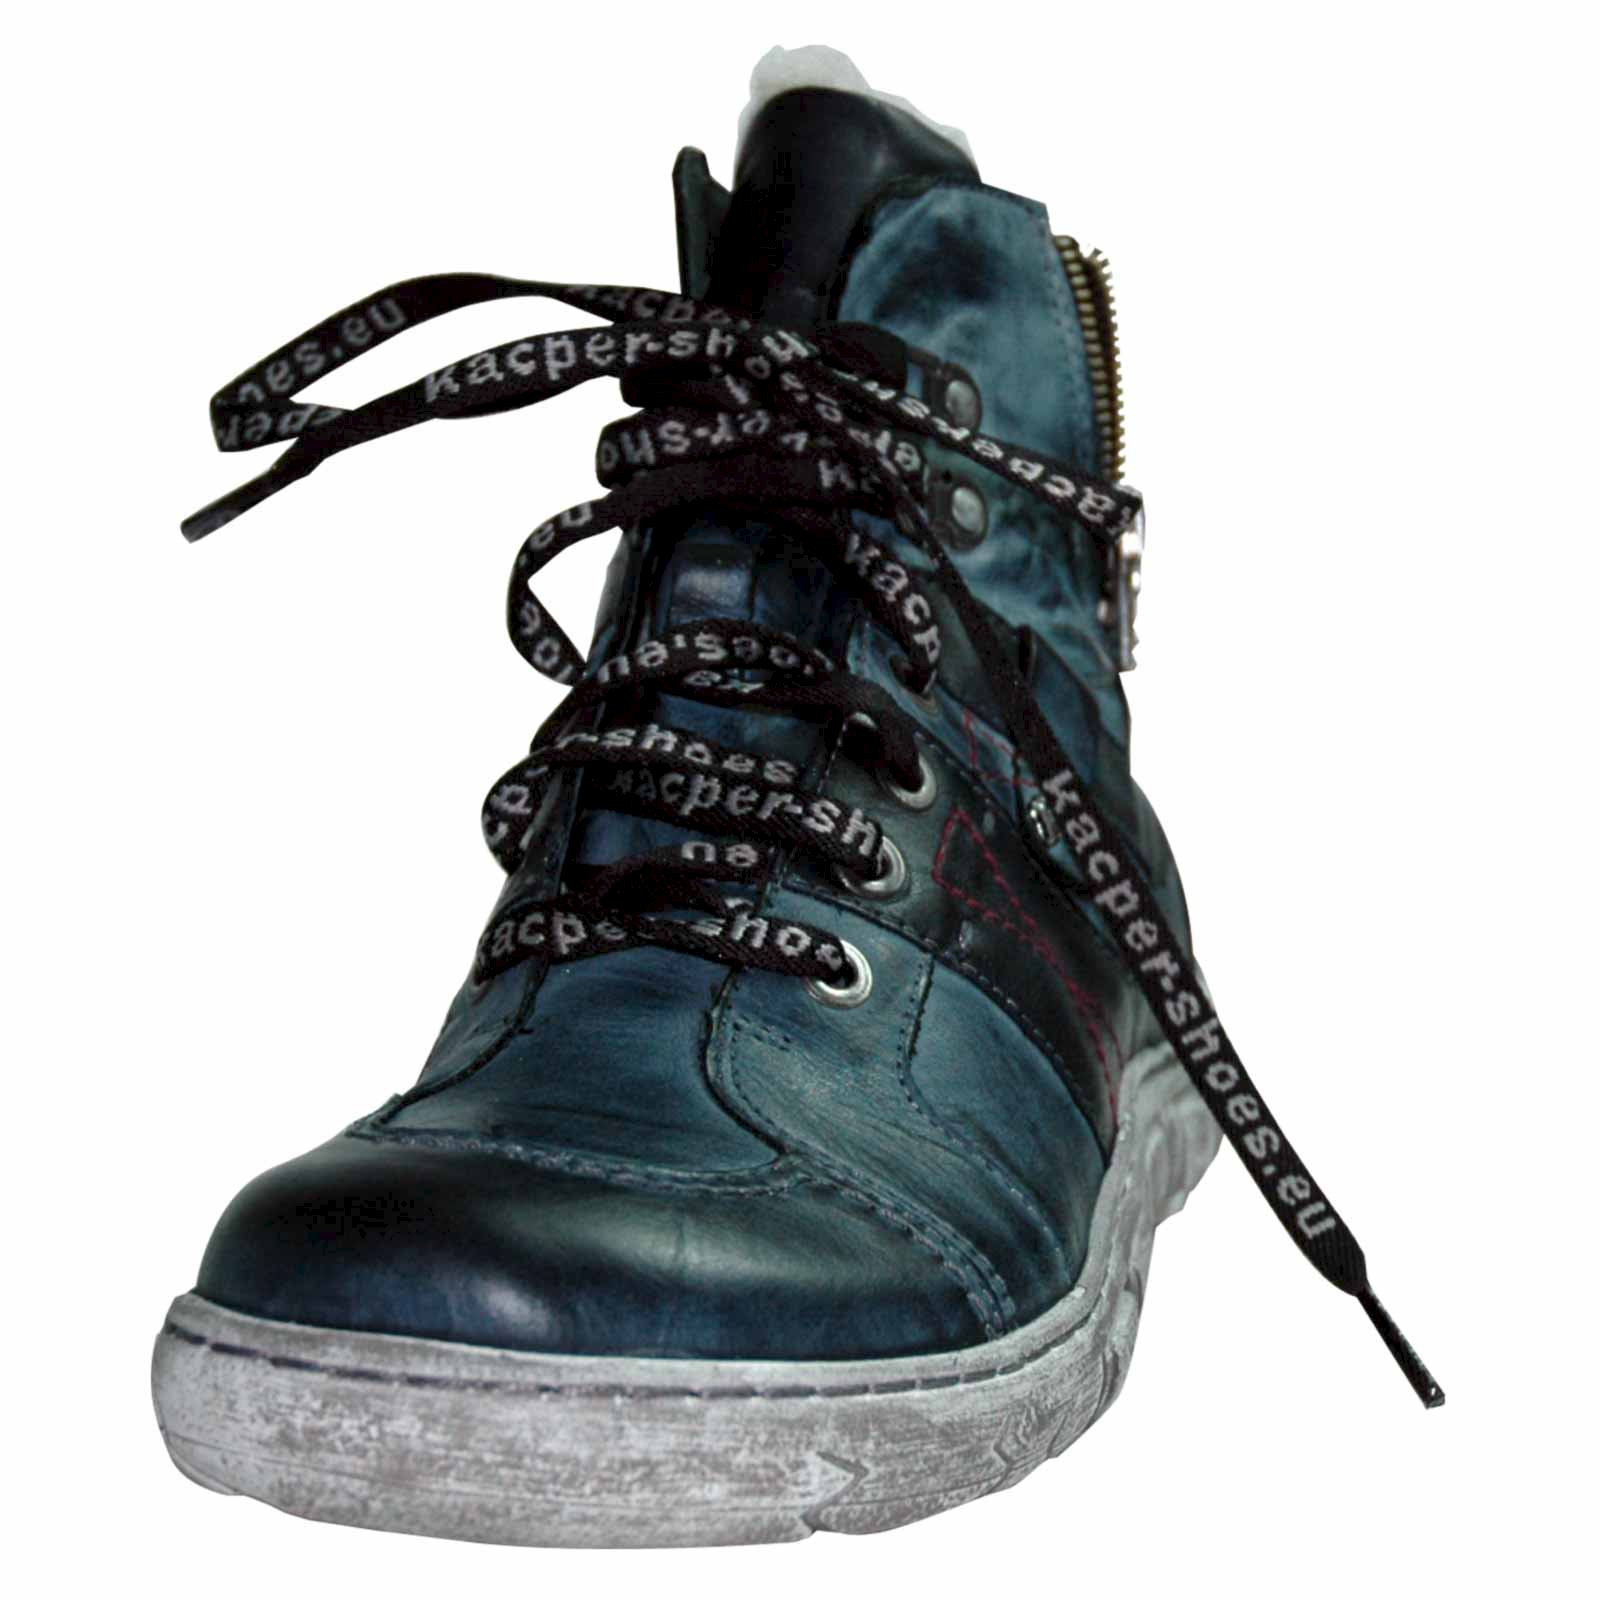 Kacper Femmes Boots, 4-1191 bleu bleu bleu foncé   Modèles à La Mode  4a74d4